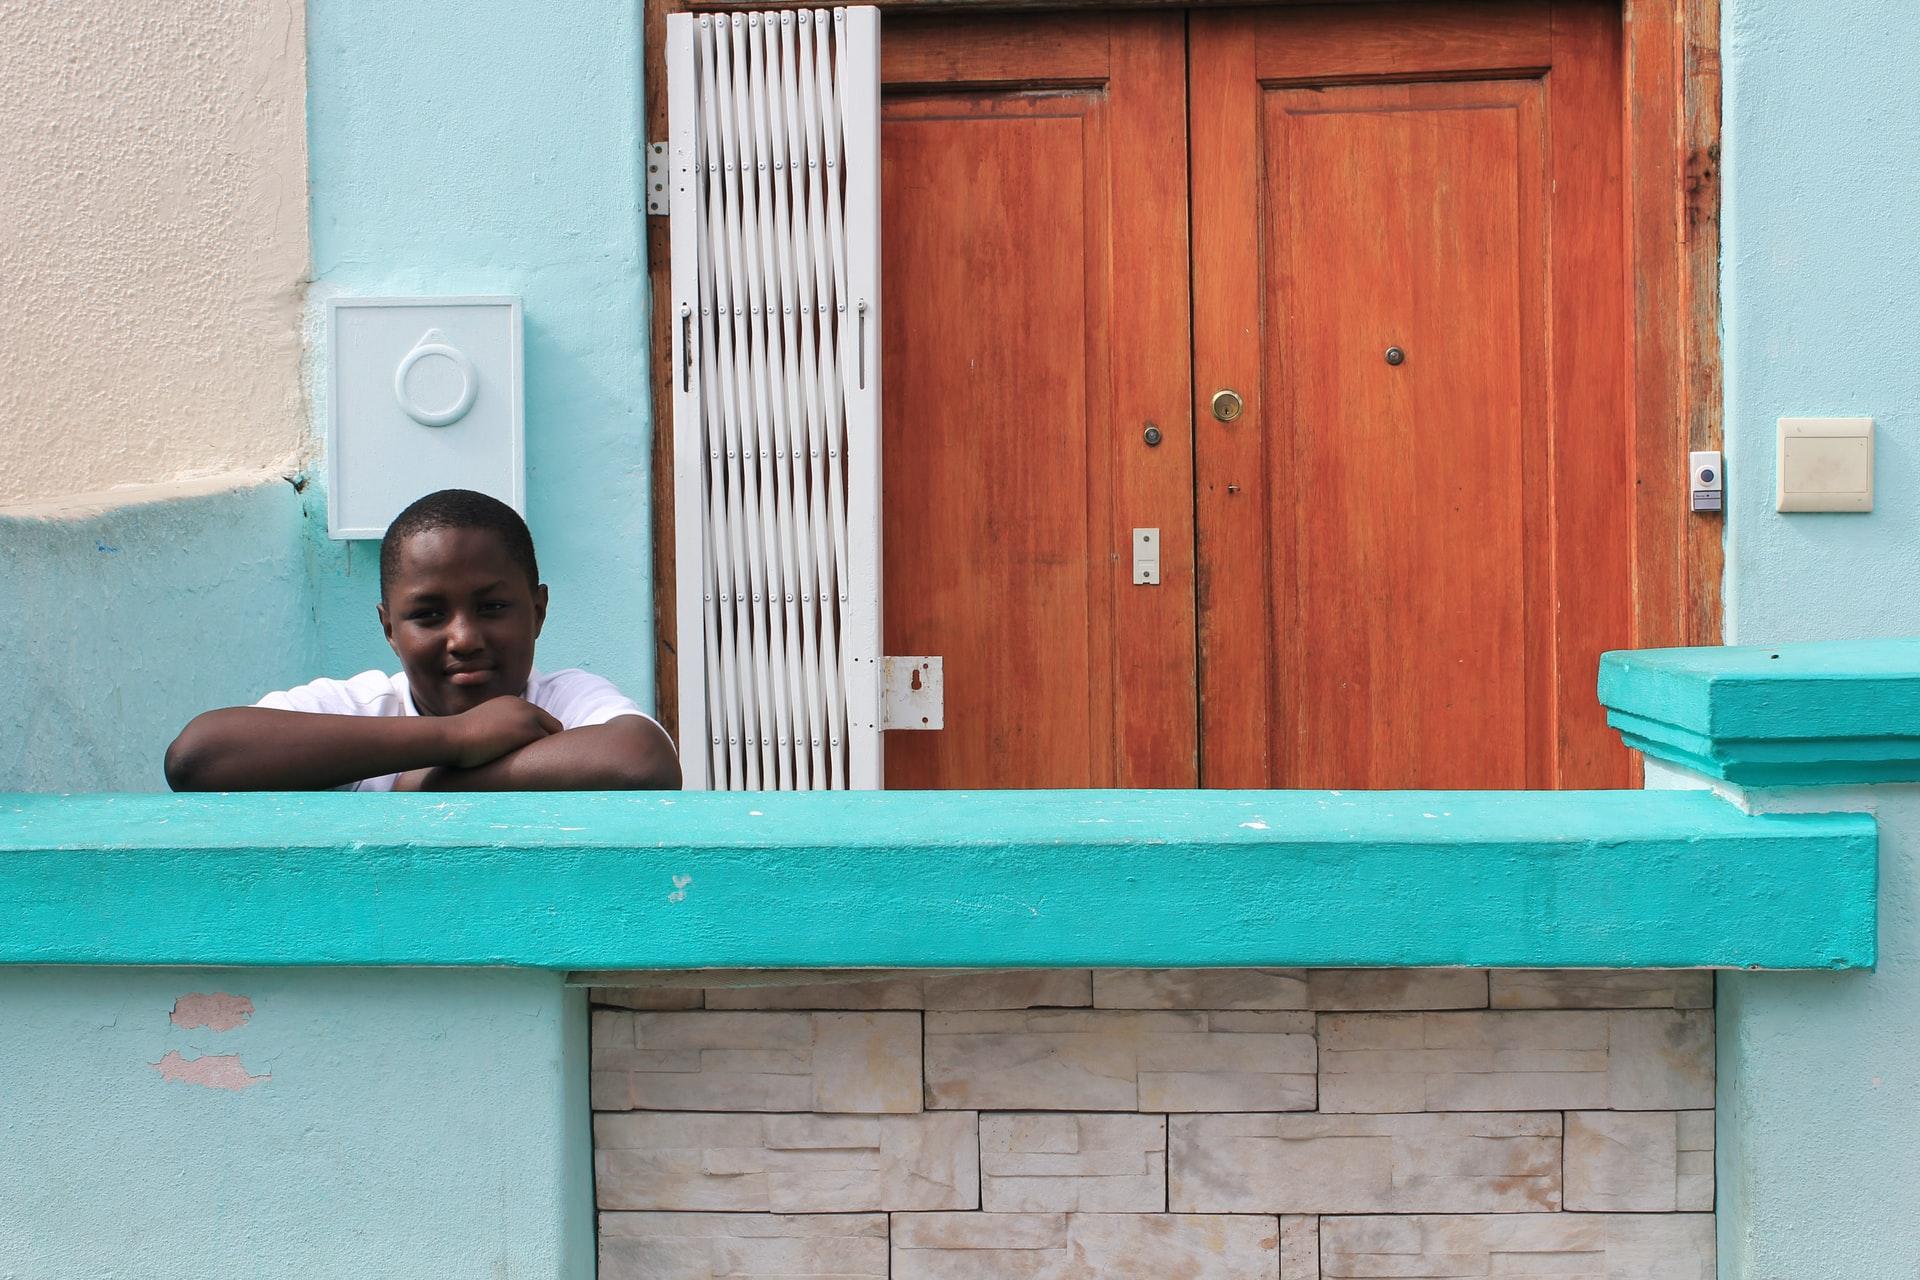 Kid in Bo Kaap, South Africa - Savannah Koomen / Unsplash